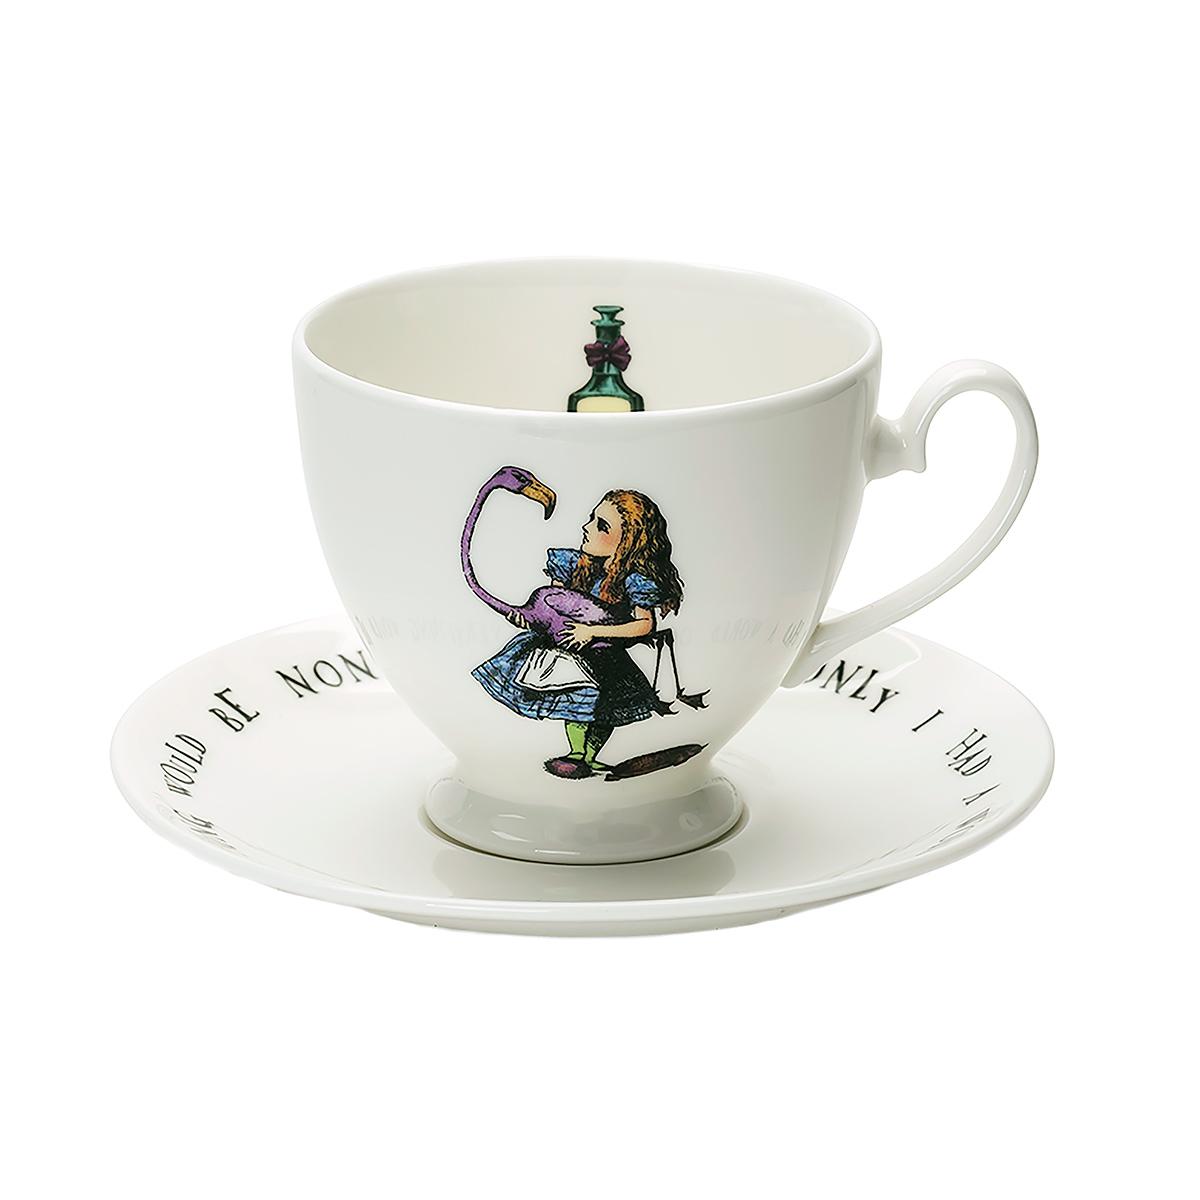 Alice in Wonderland tea cup set